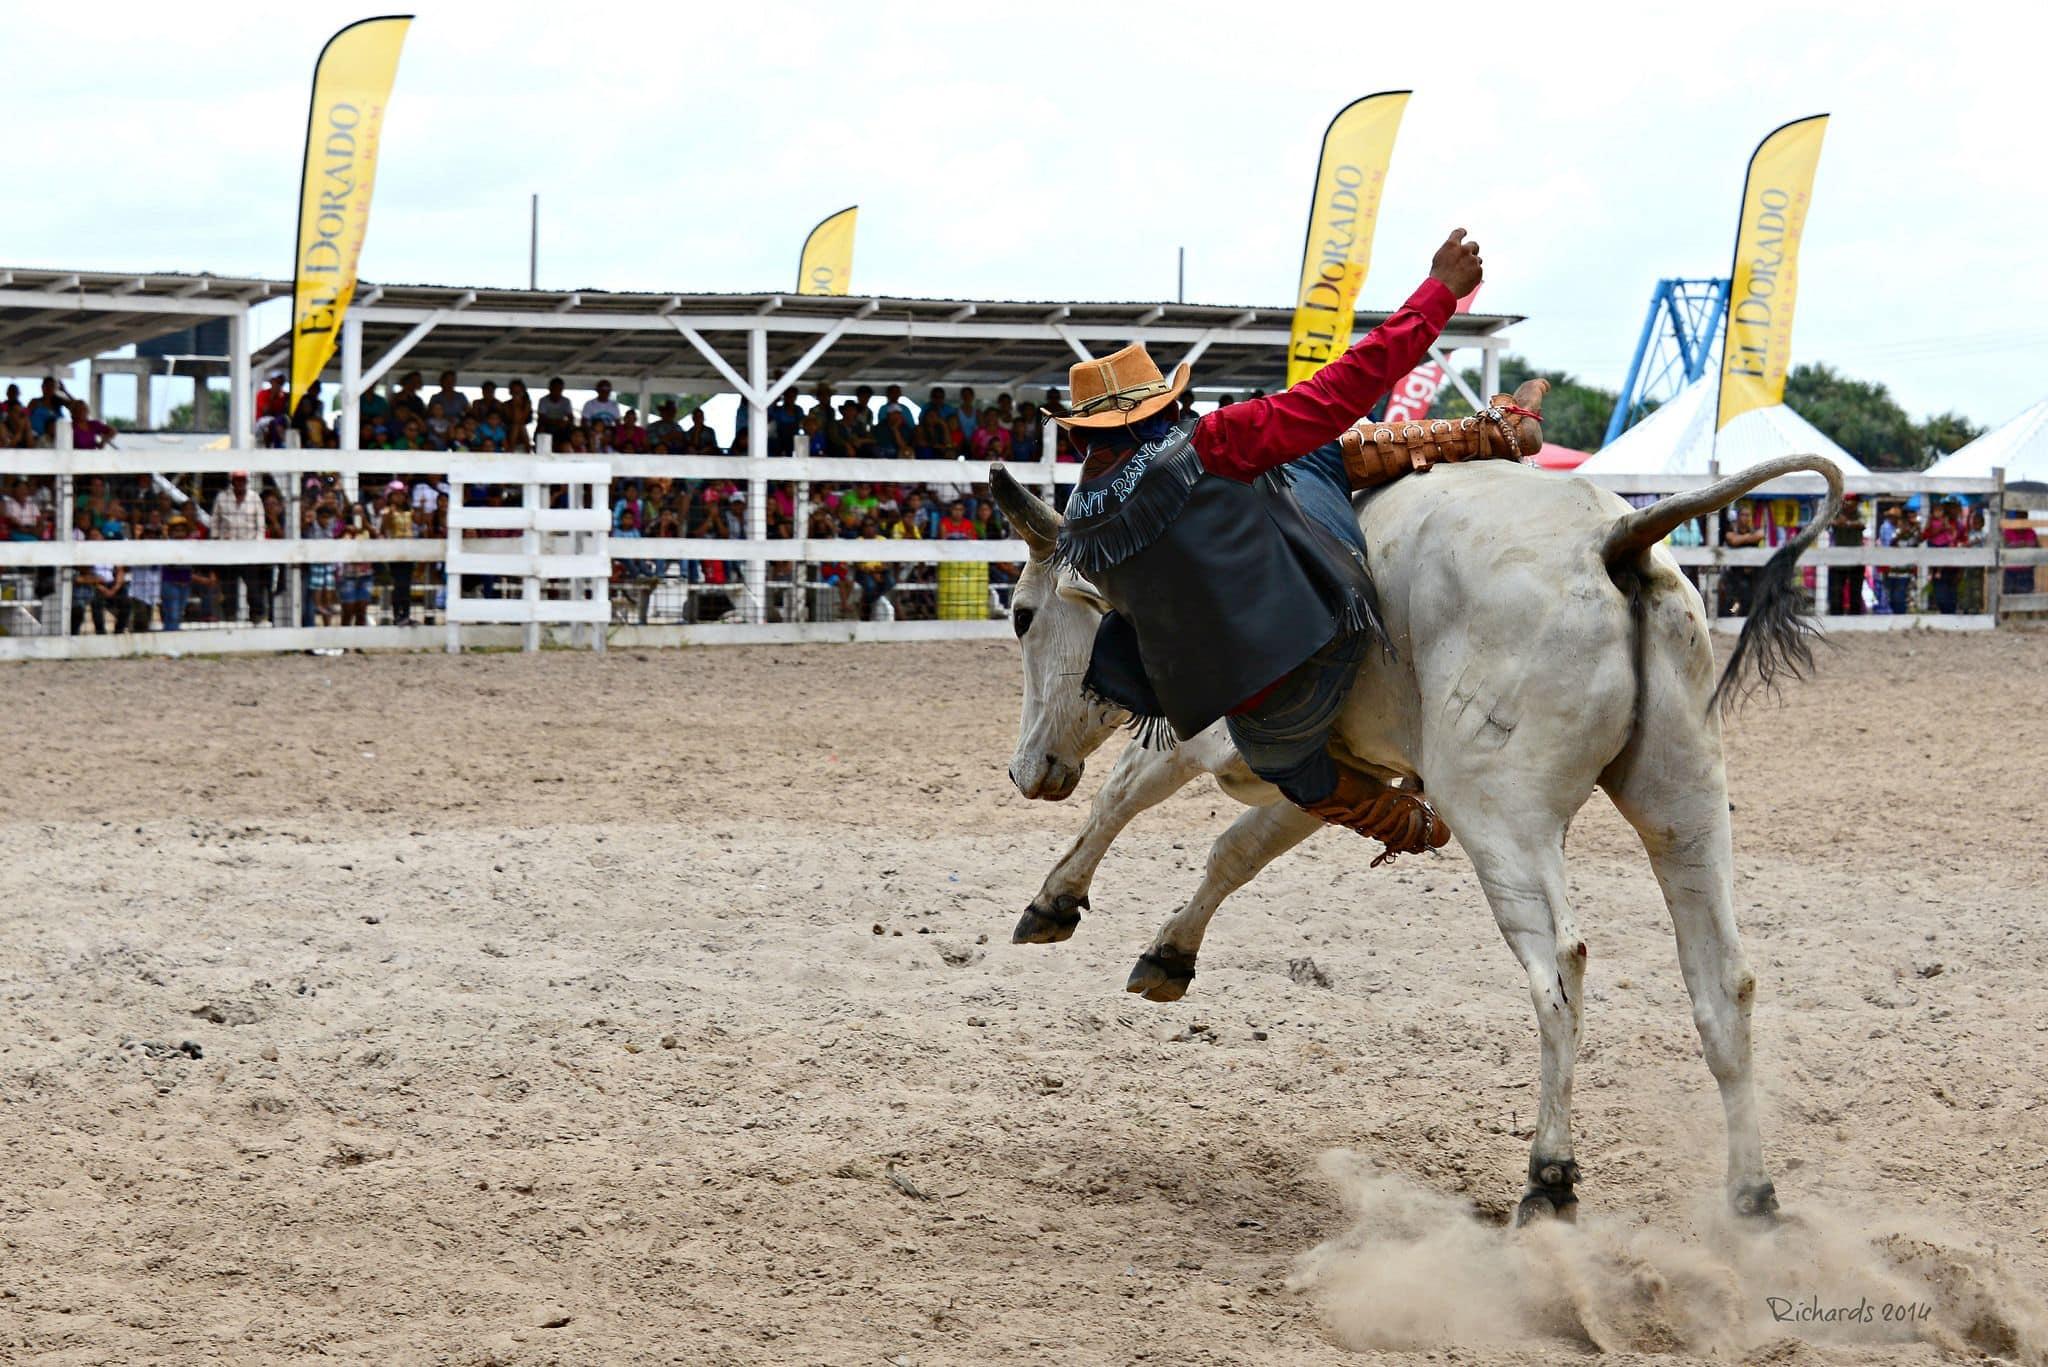 Saddle Up for Guyana's Wild Rupununi Rodeo